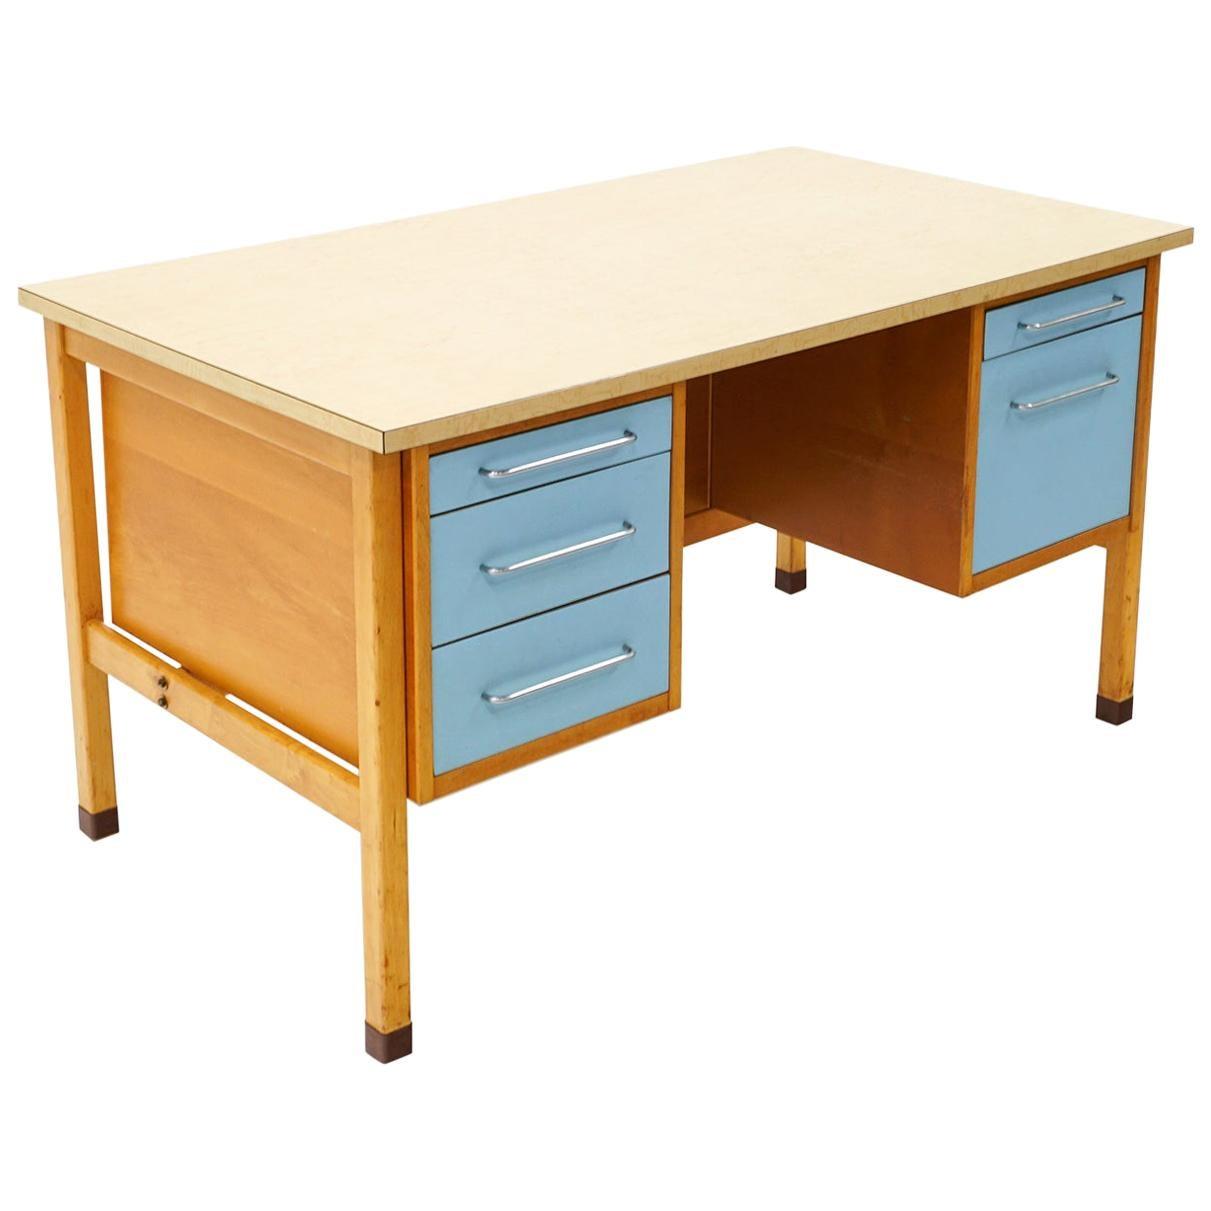 Desk by Jens Risom, Blonde Wood, Blue Drawer Fronts, Chrome Pulls, Laminate Top